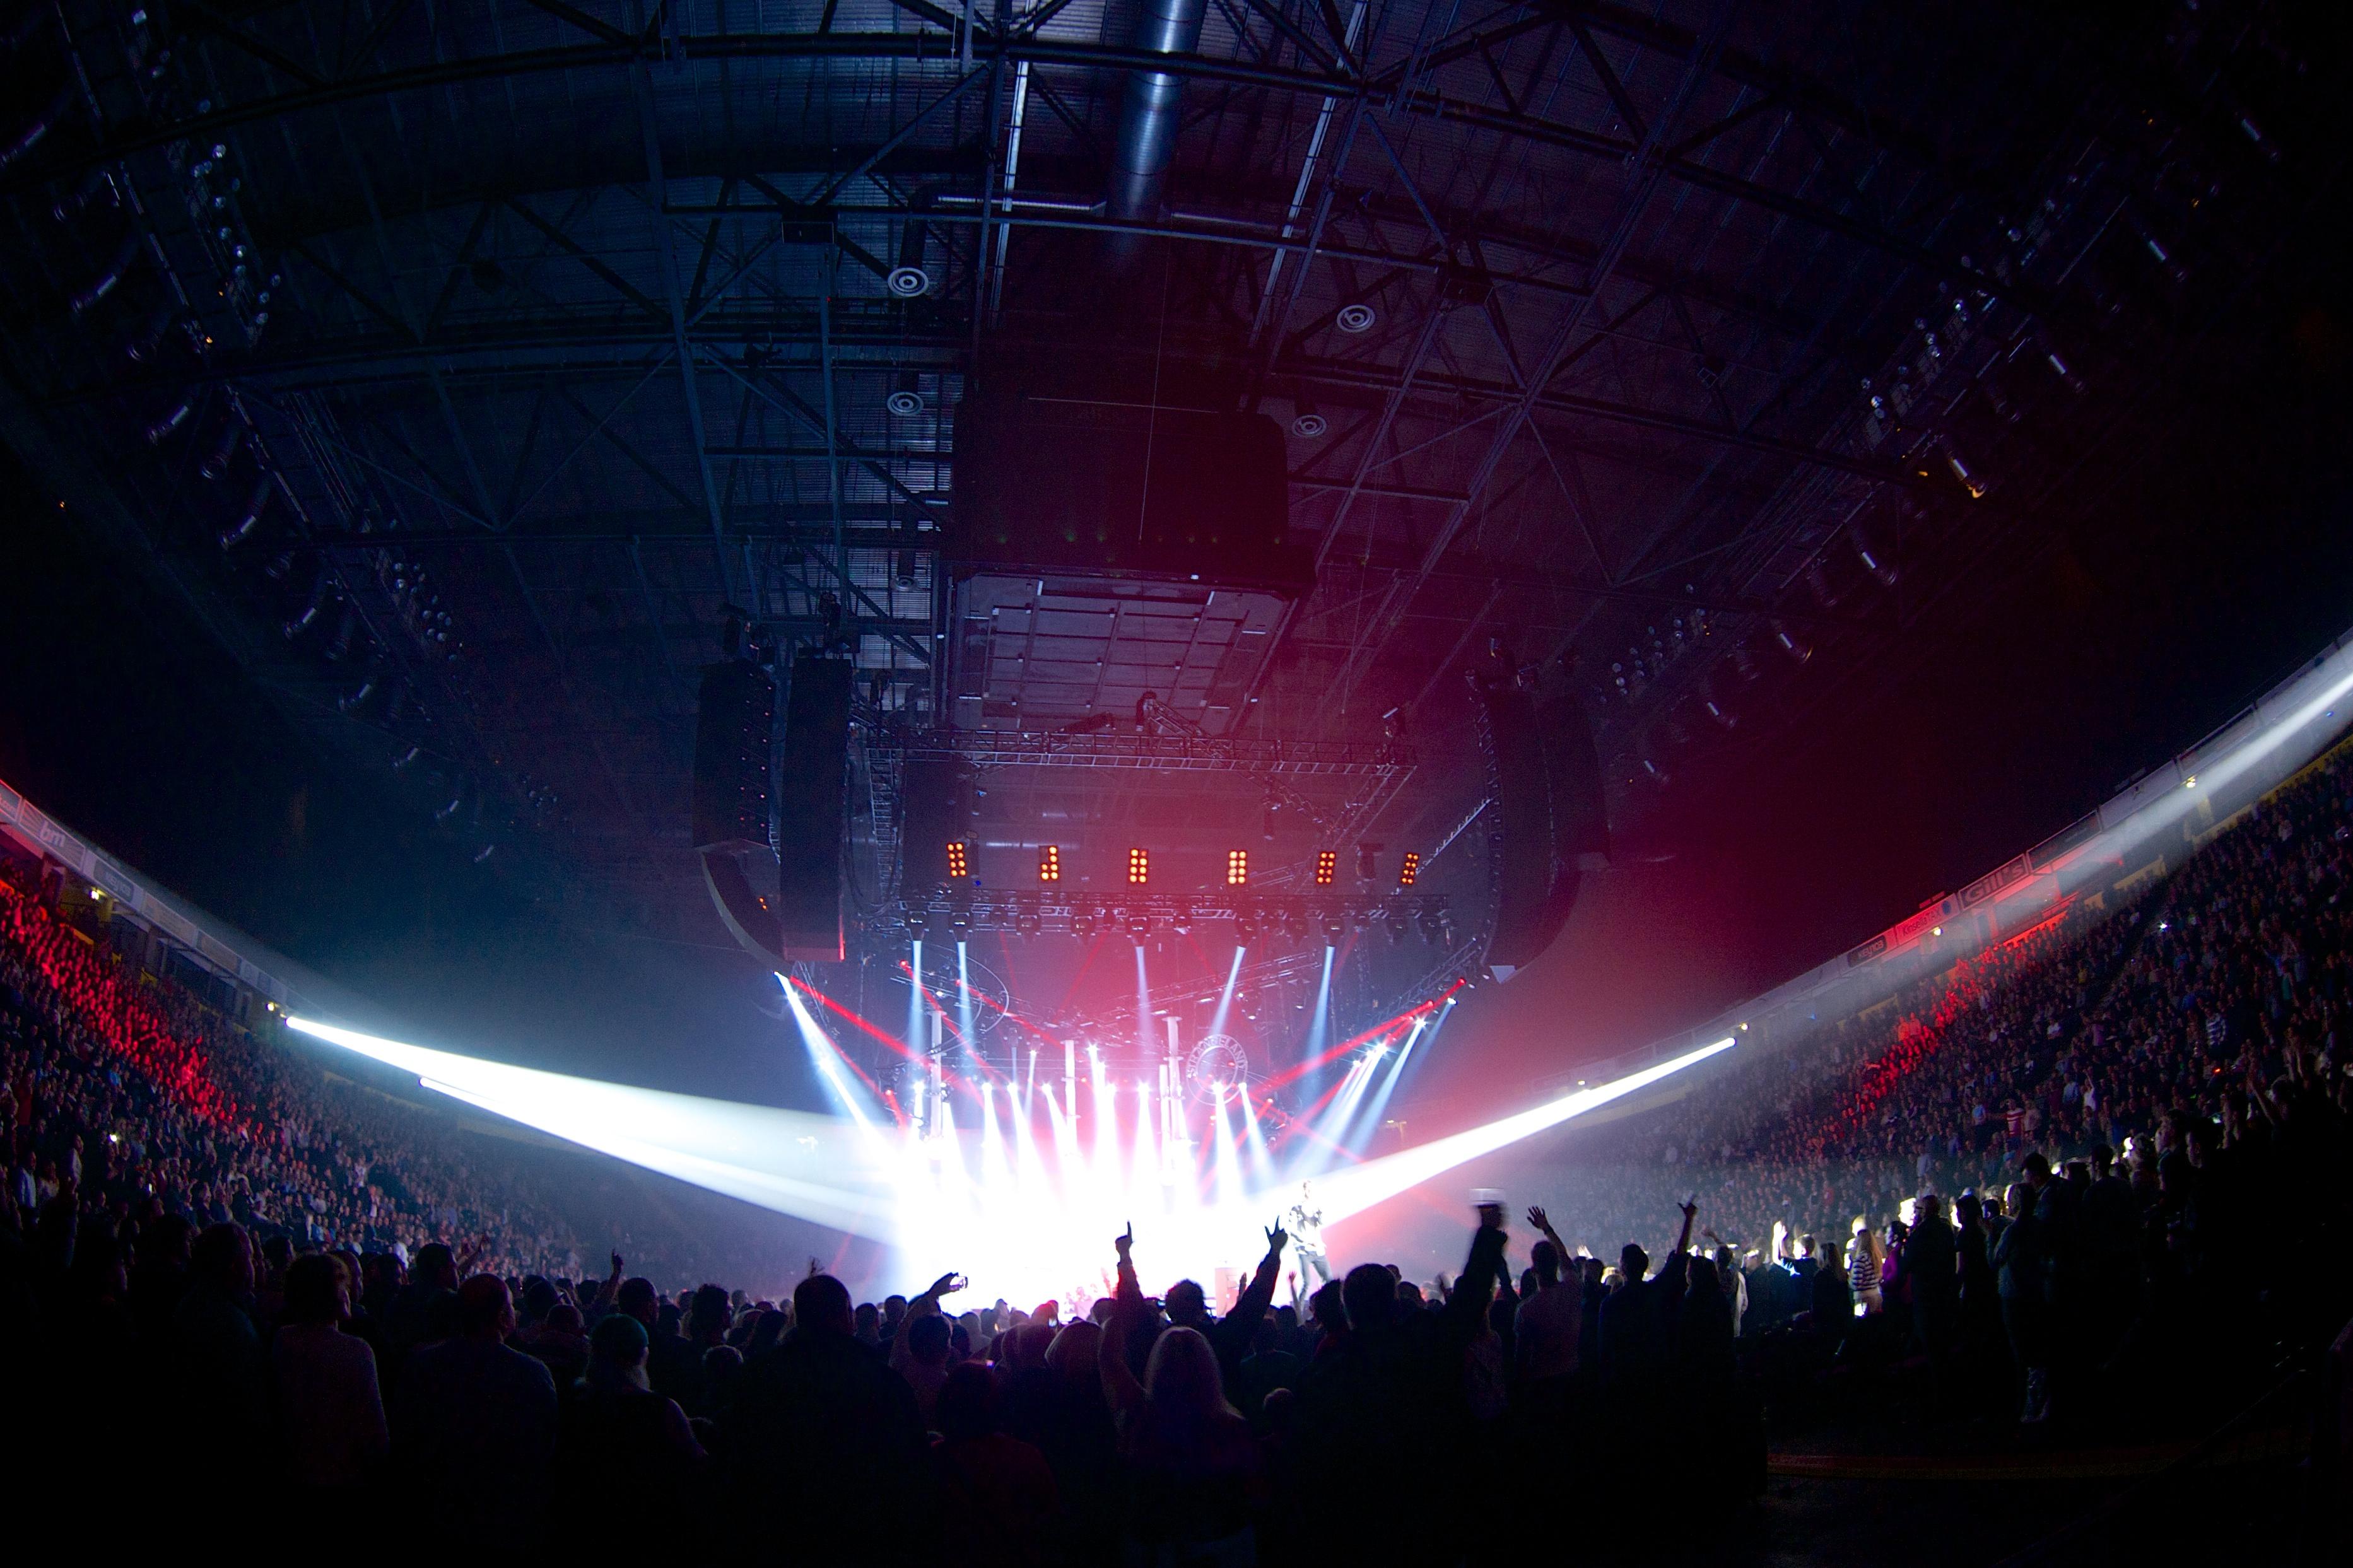 Manchester_Arena_concert,_November_2012.jpg